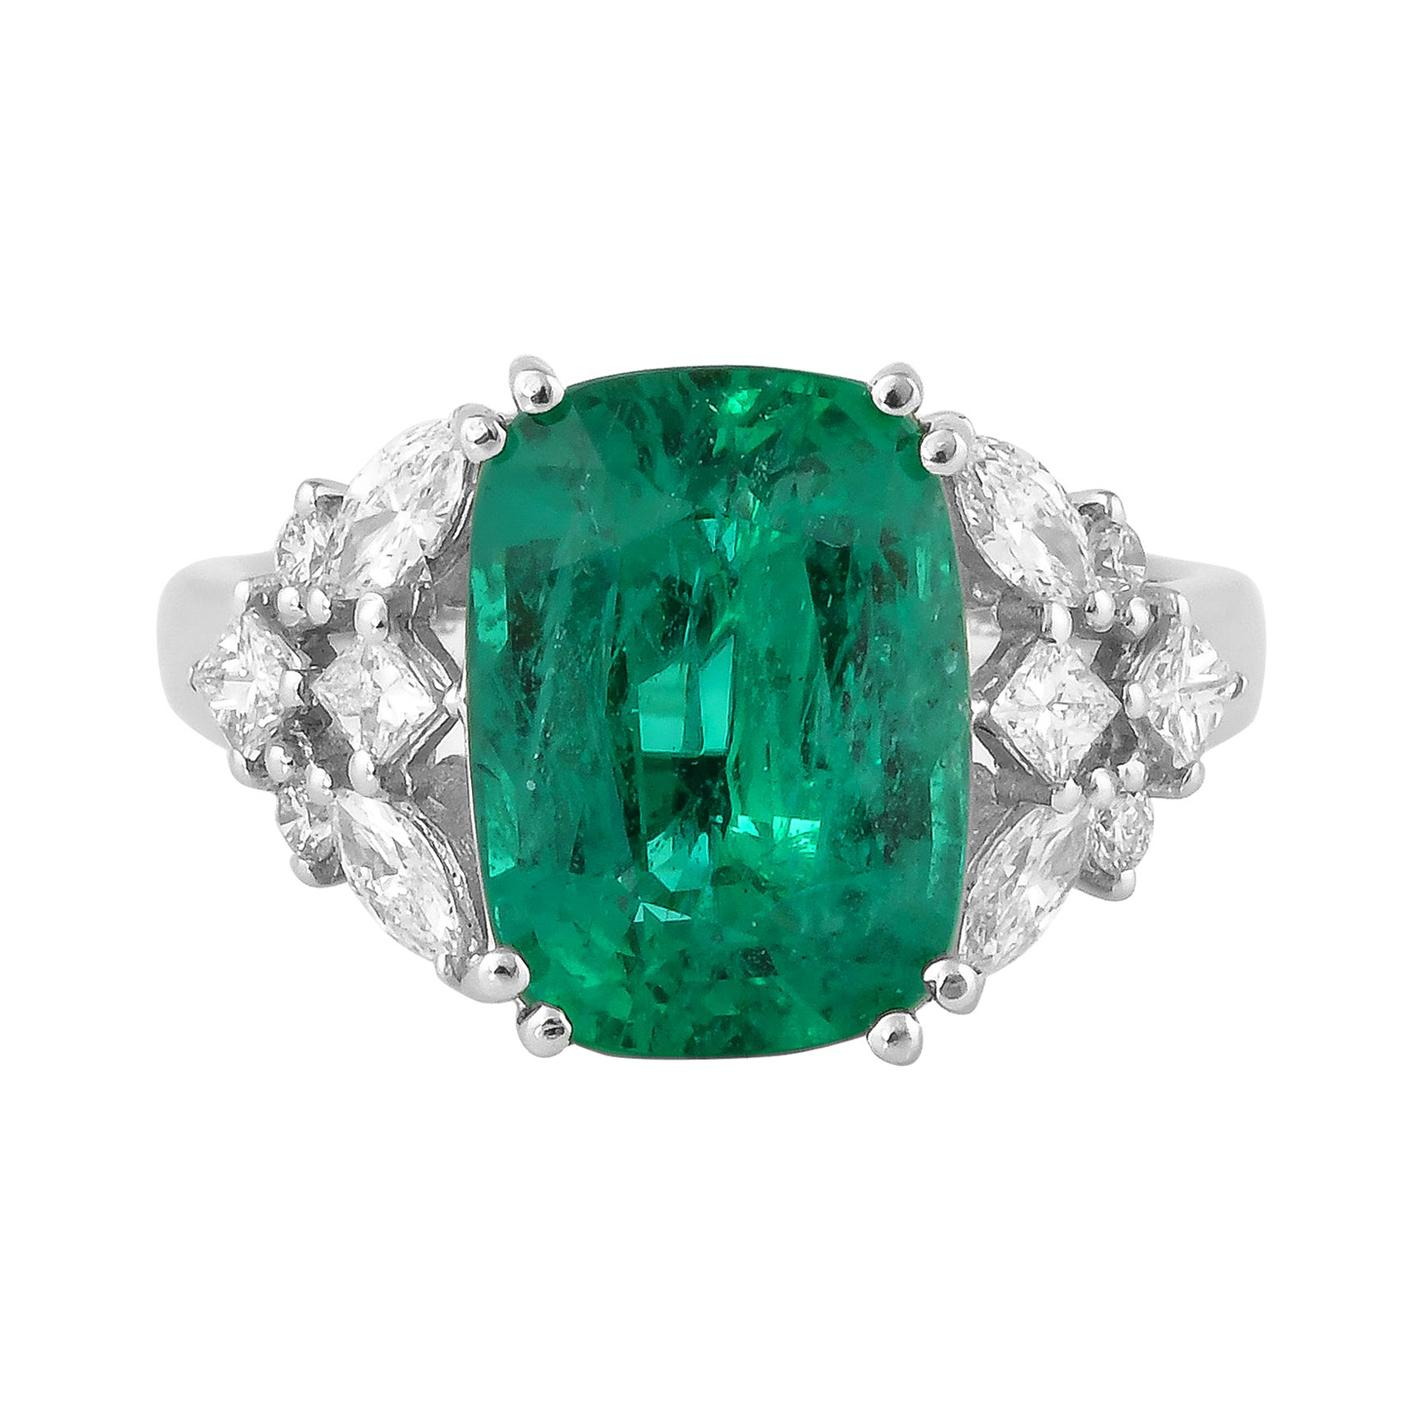 4.5 Carat Zambian Emerald and White Diamond Ring in 18 Karat White Gold